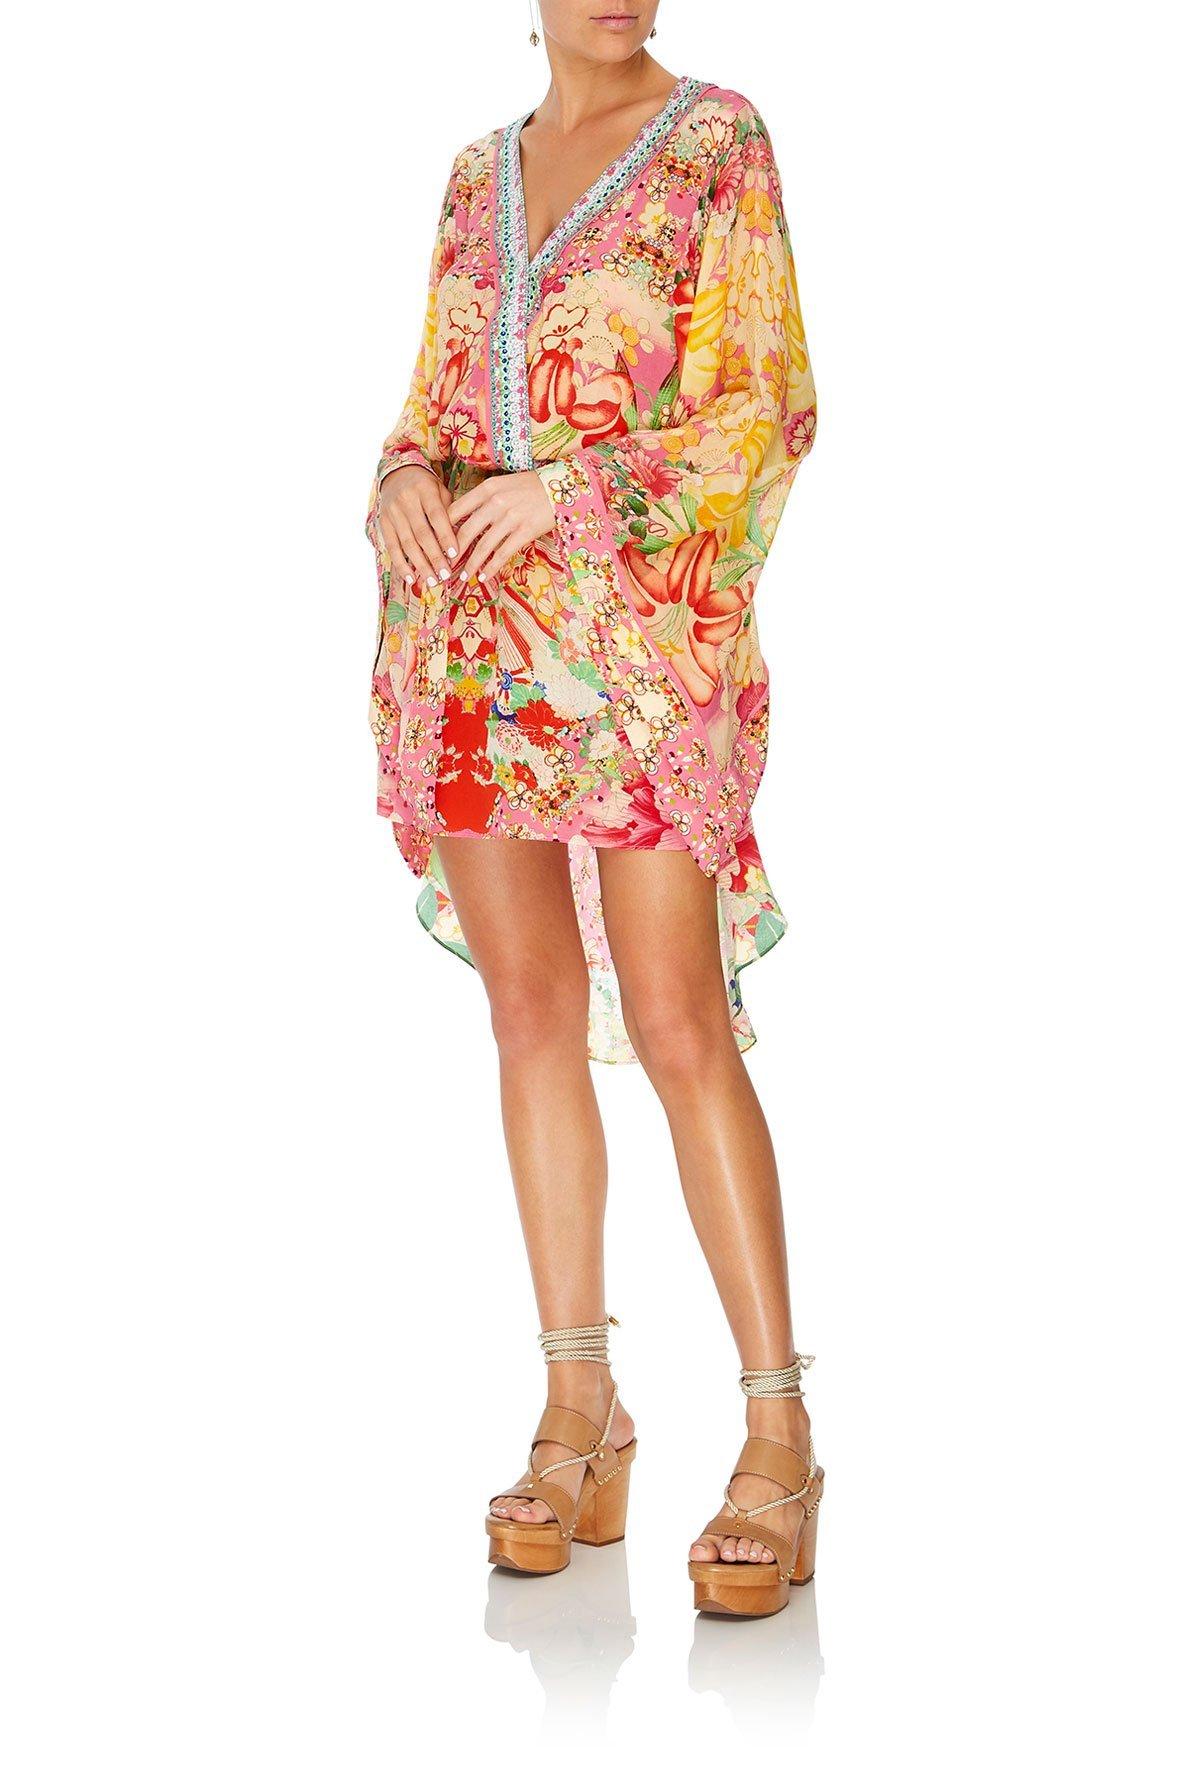 camilla_v_neck_kimono_dress_with_tie_kimono_kisses_3_1024x1024@2x